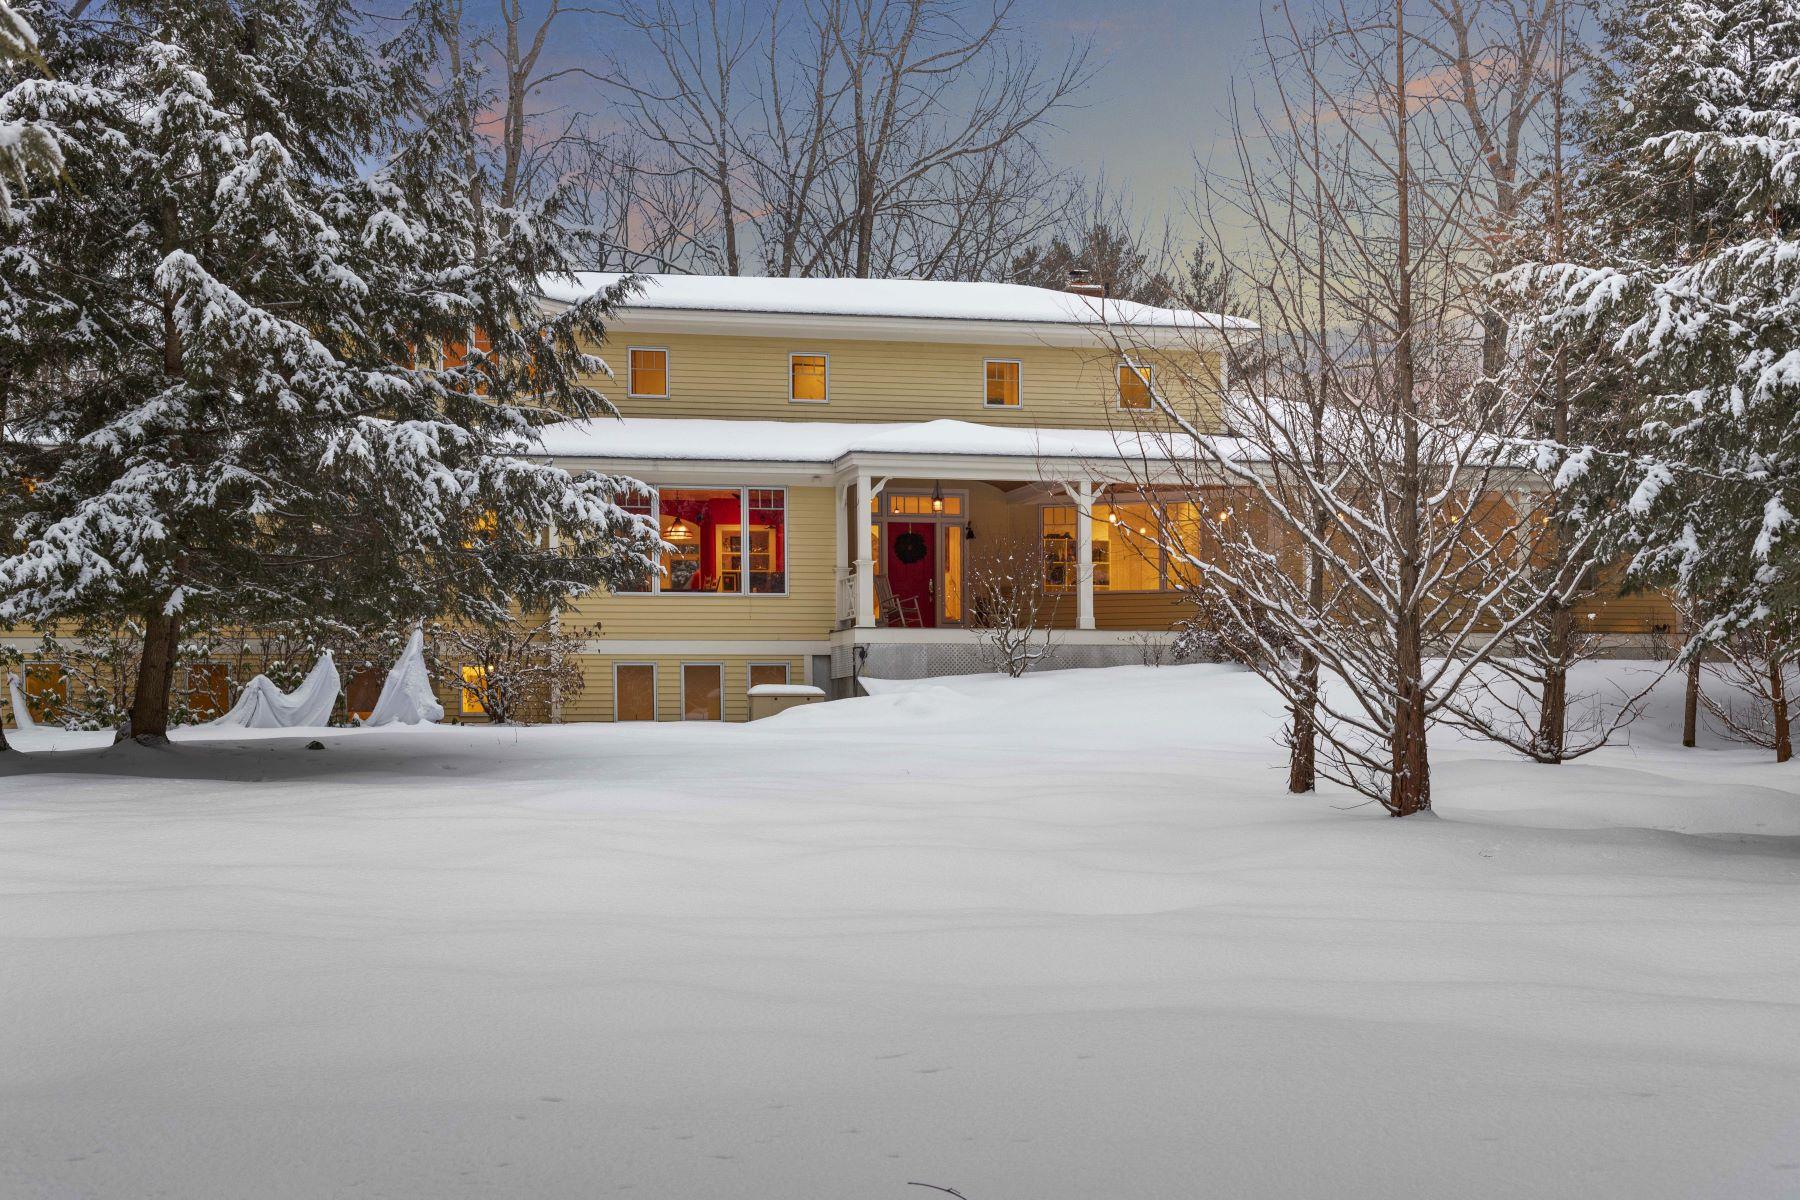 Single Family Homes for Active at Seven Tavern Lane 7 Tavern Lane Lyme, New Hampshire 03768 United States